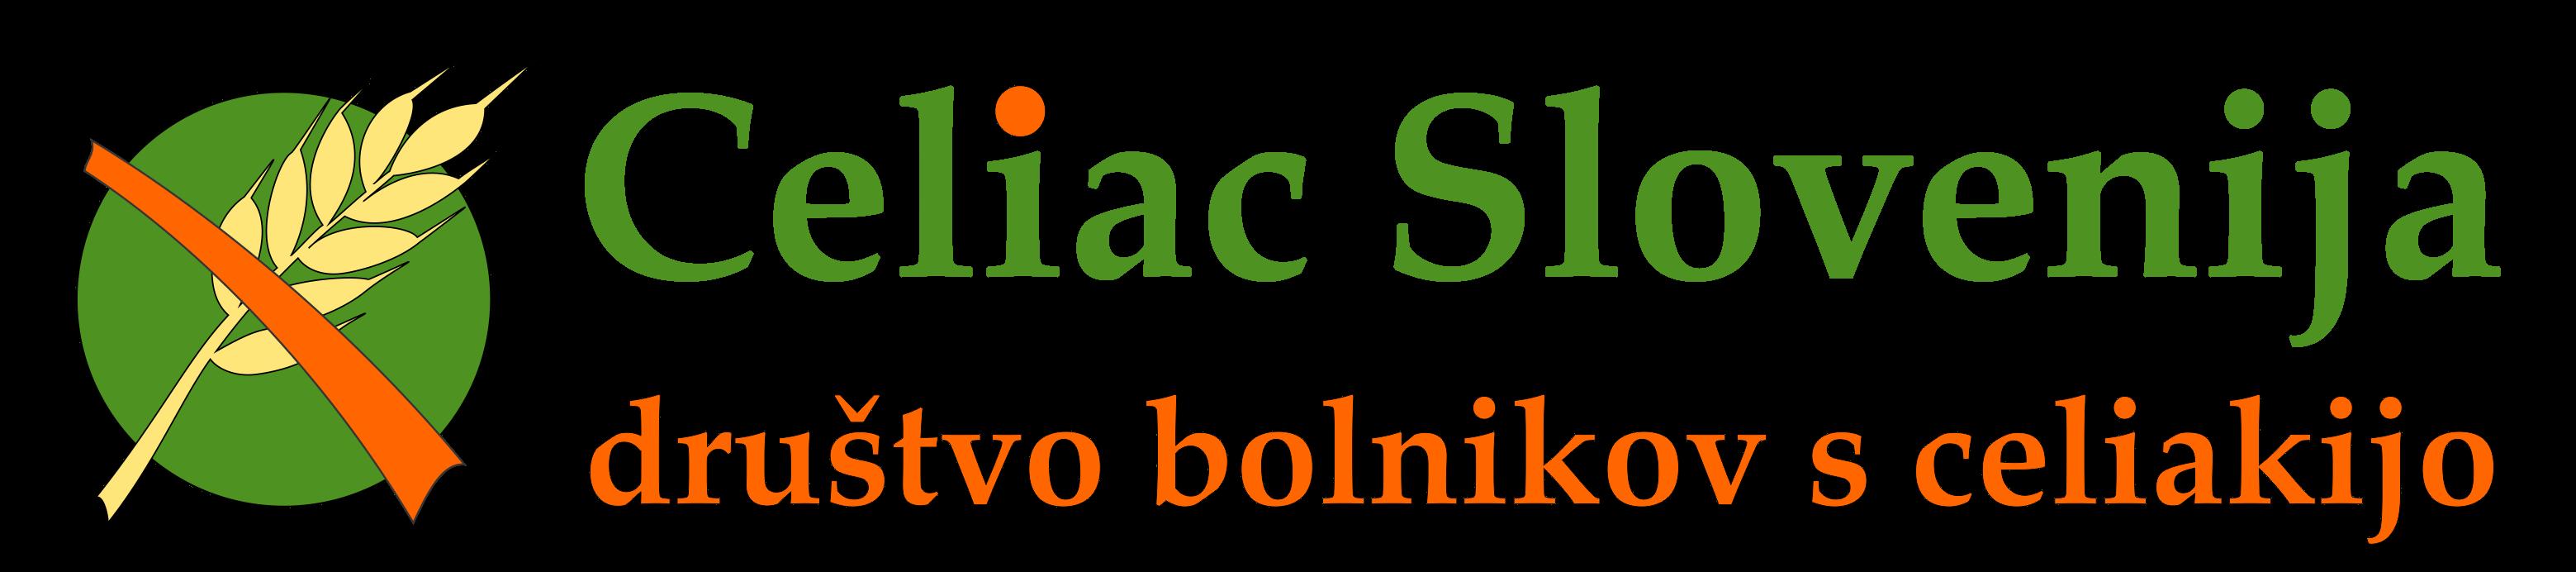 Celiac Slovenija